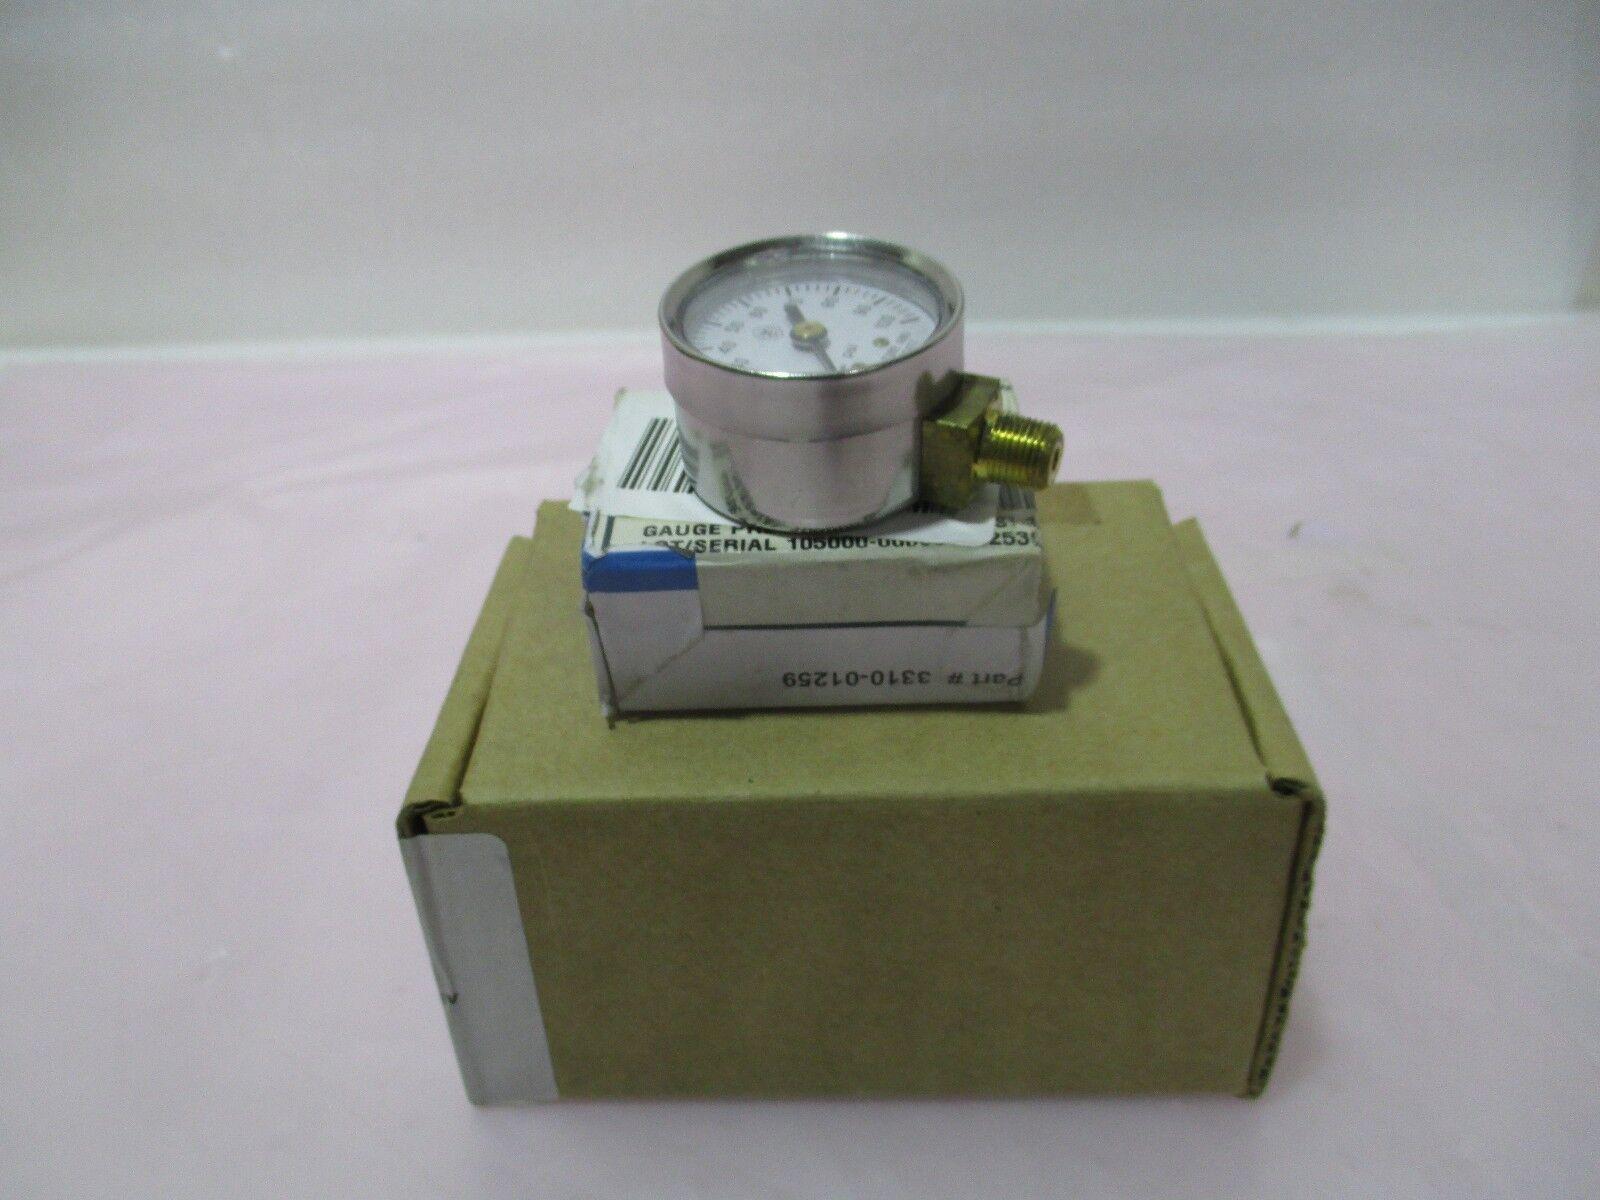 "AMAT 3310-01259 Gauge Press 1.5"" DIA 0-100PSI 1/8NPT BOTT, 421013"